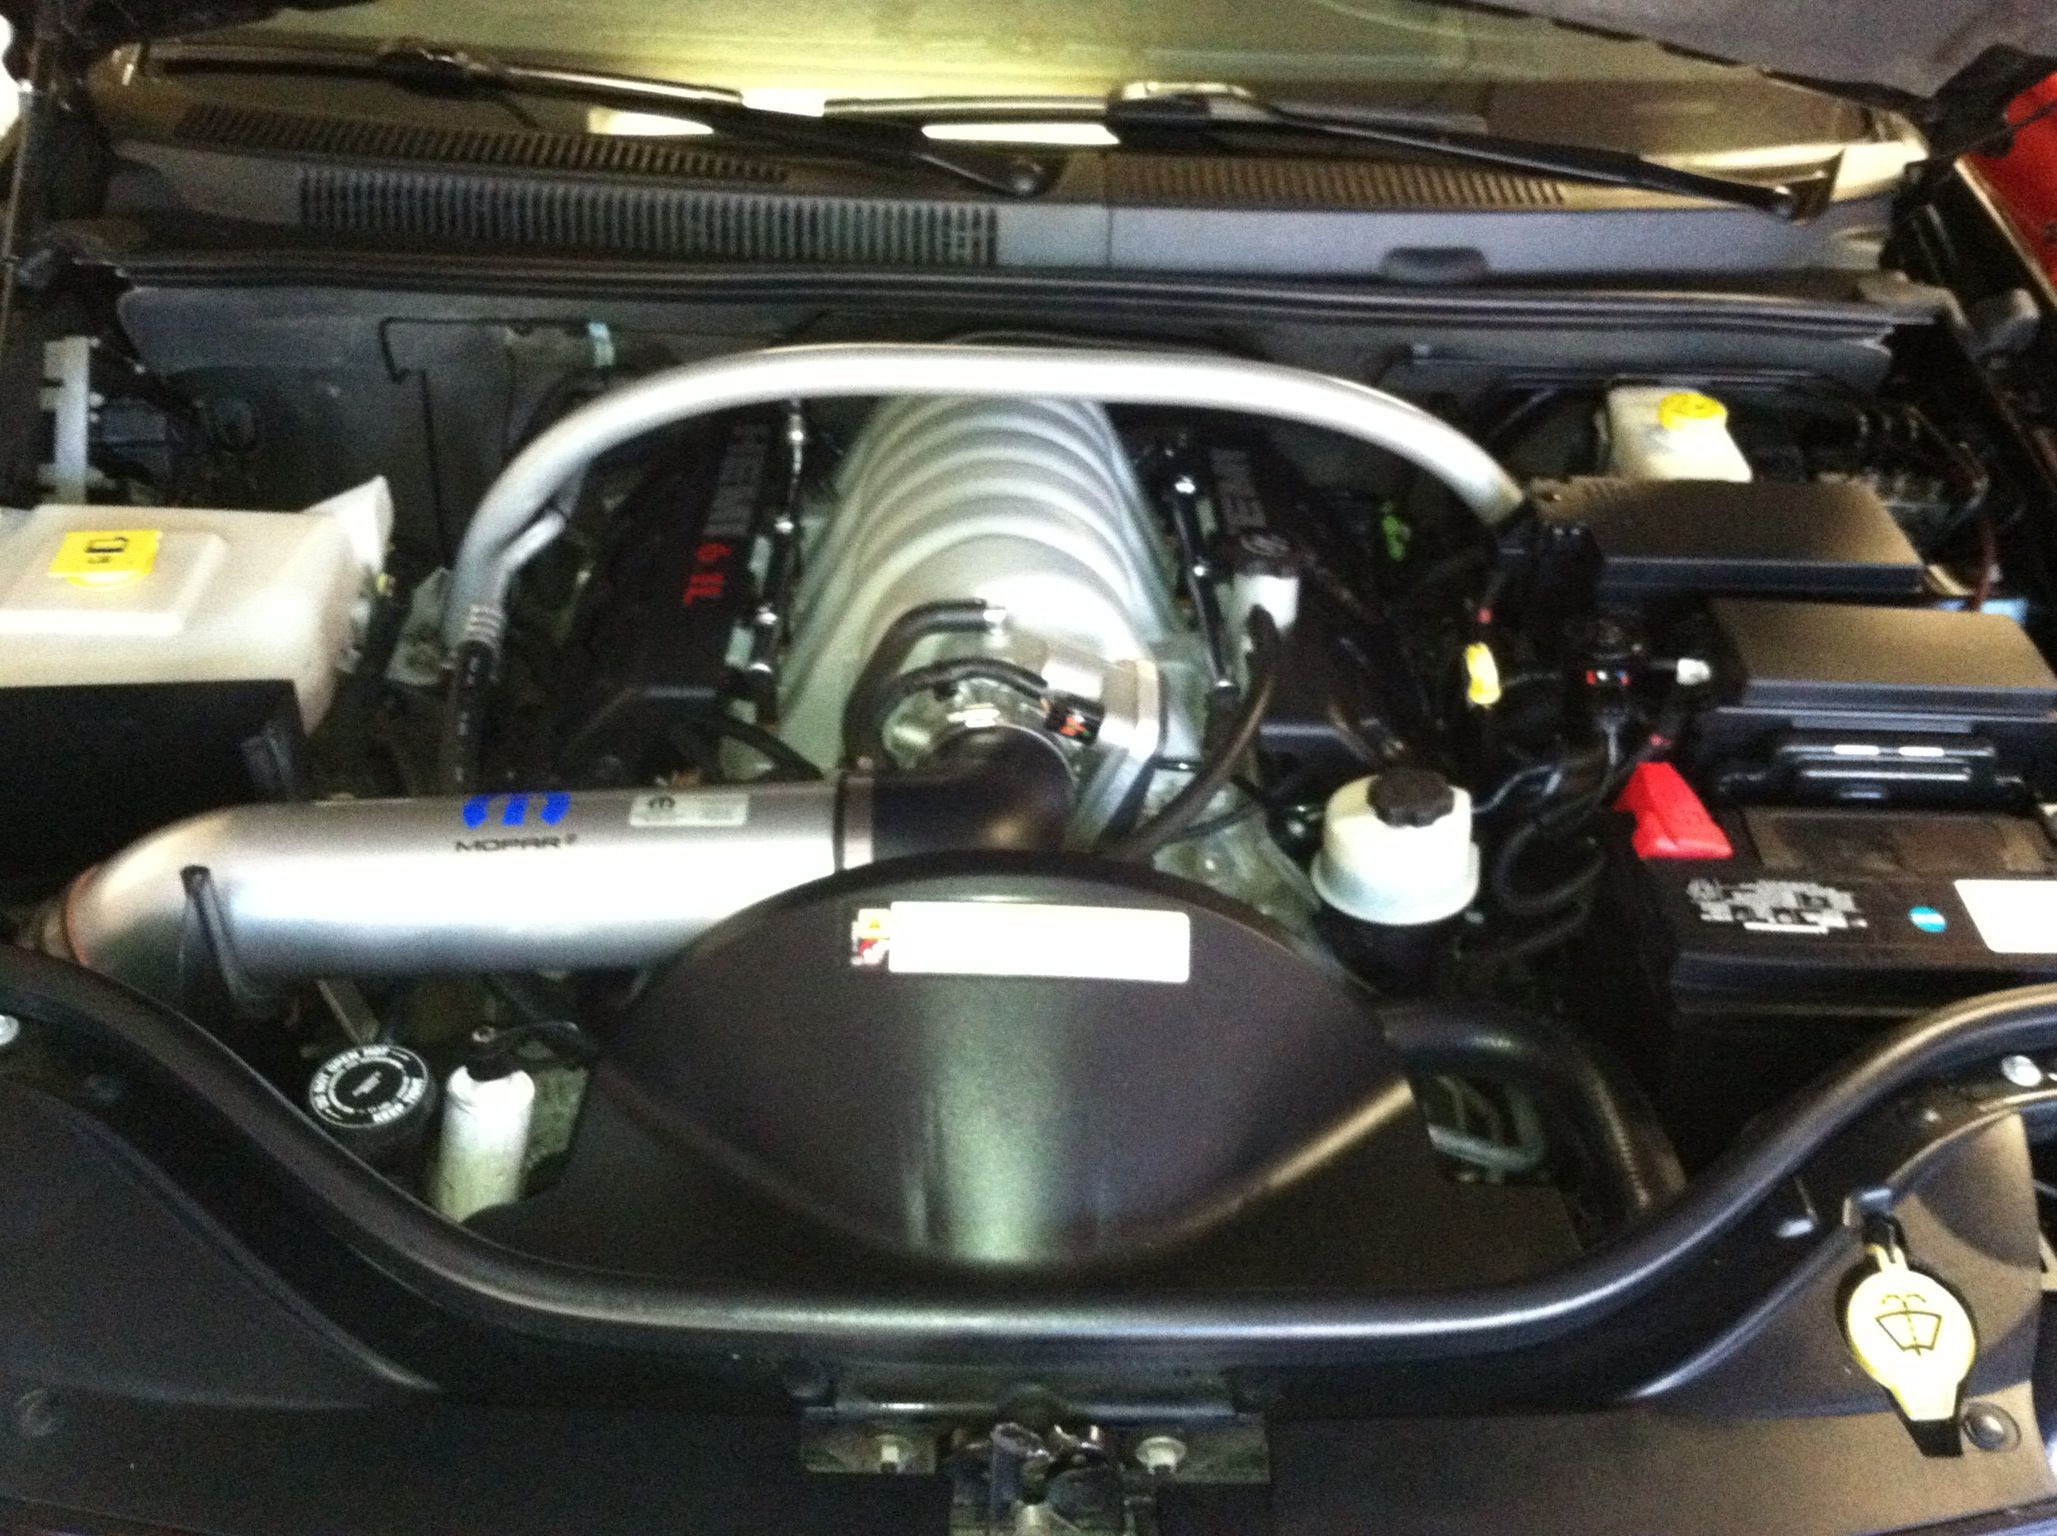 Weathertech floor mats grand forks - 2010 Jeep Grand Cherokee Srt8 6 4l V8 420hp Engine With Mopar Cold Air Intake